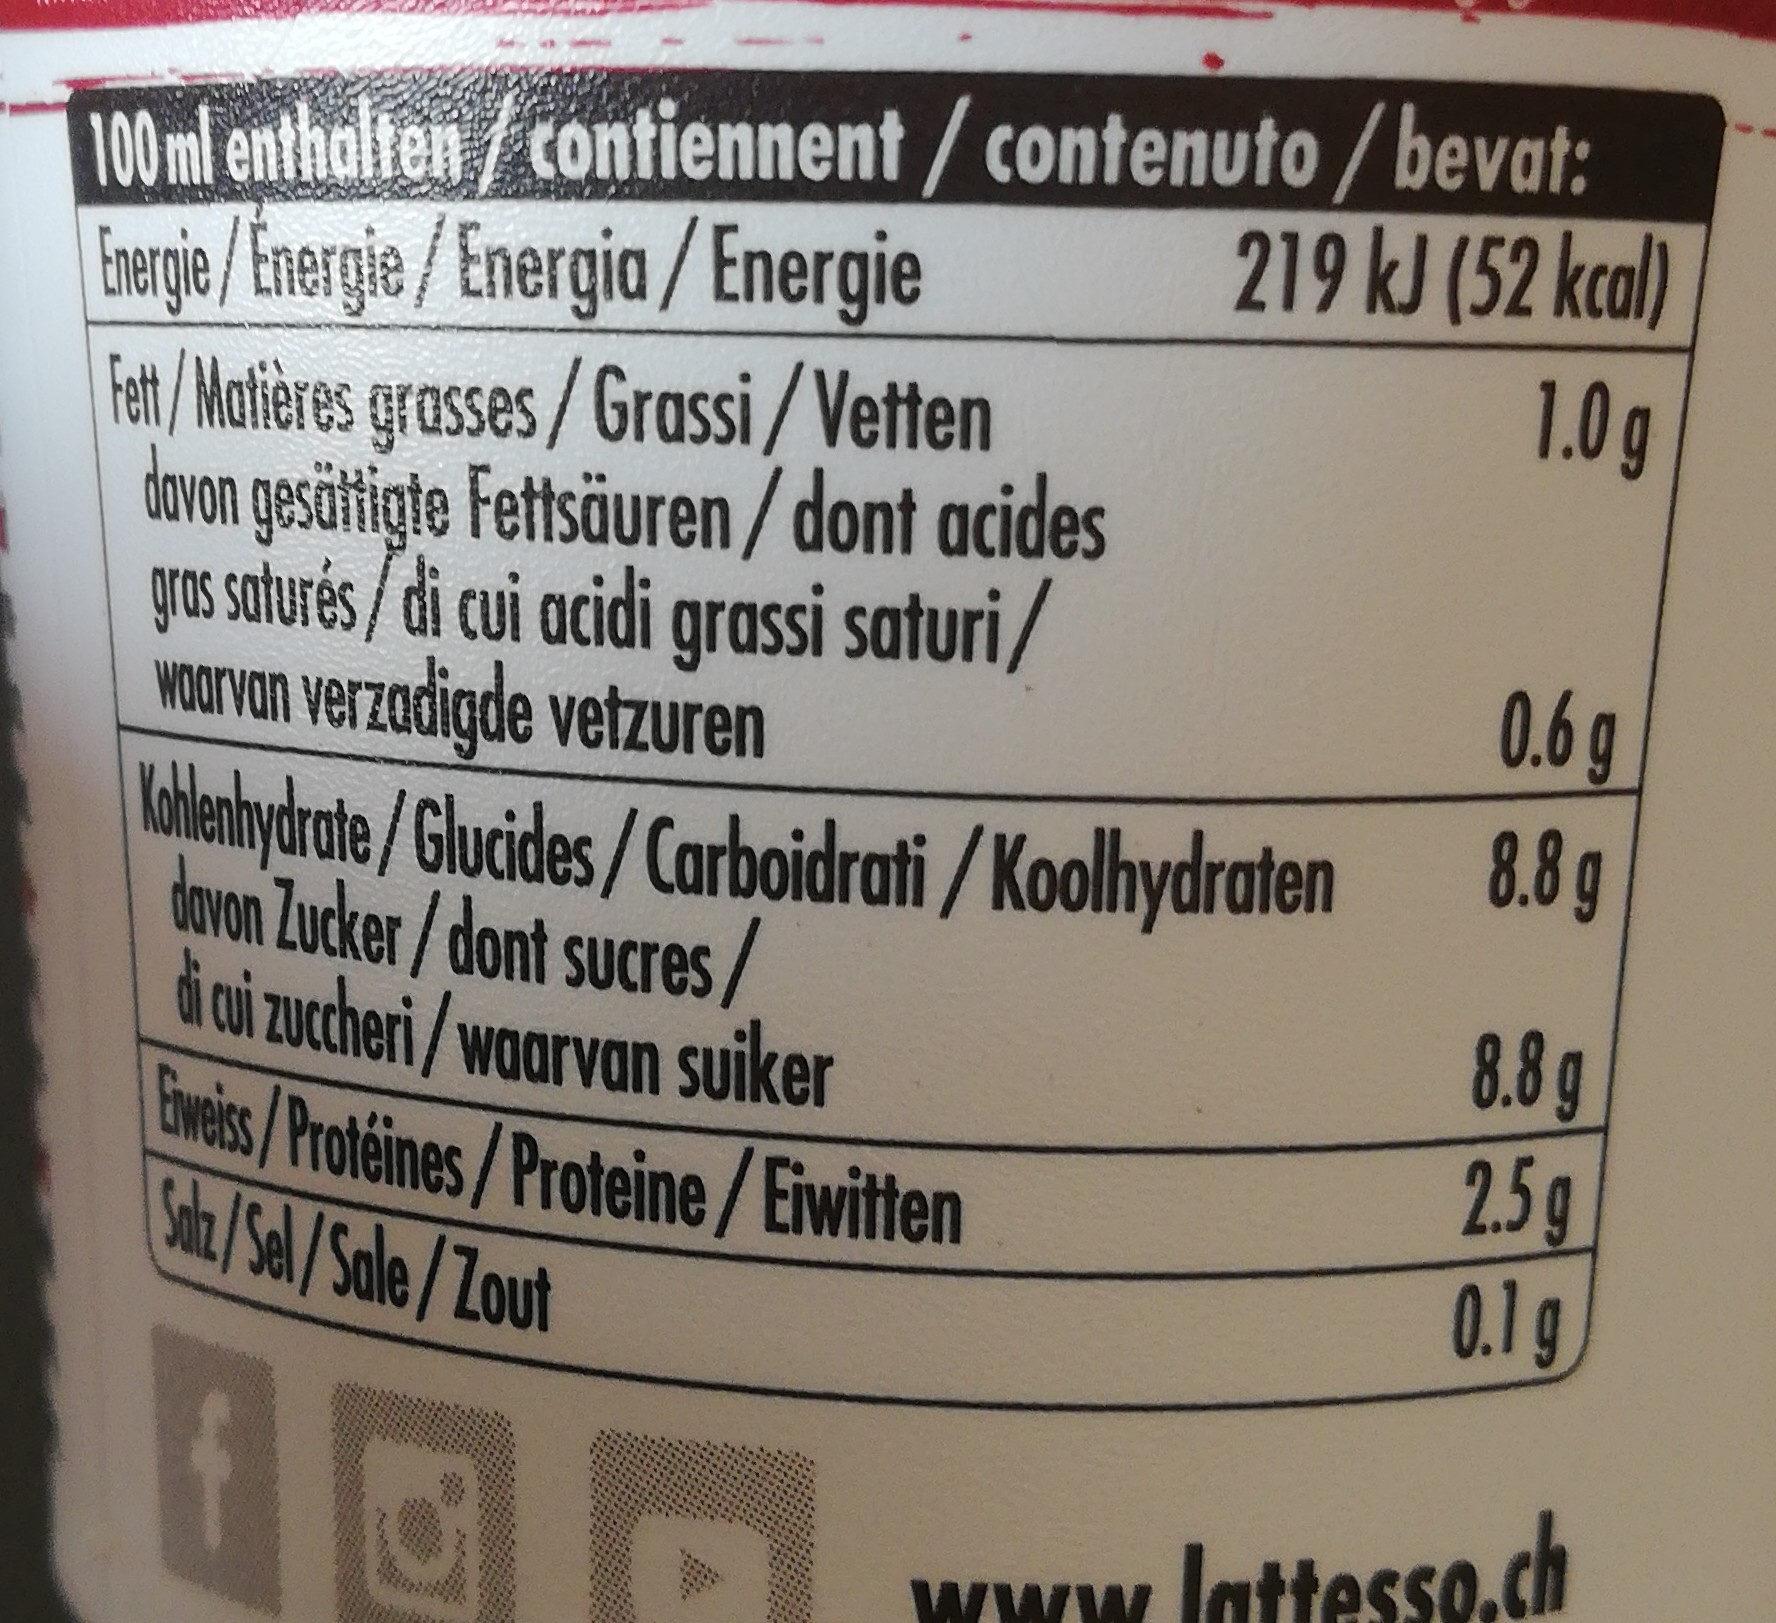 Caffè lattesso espresso - Informations nutritionnelles